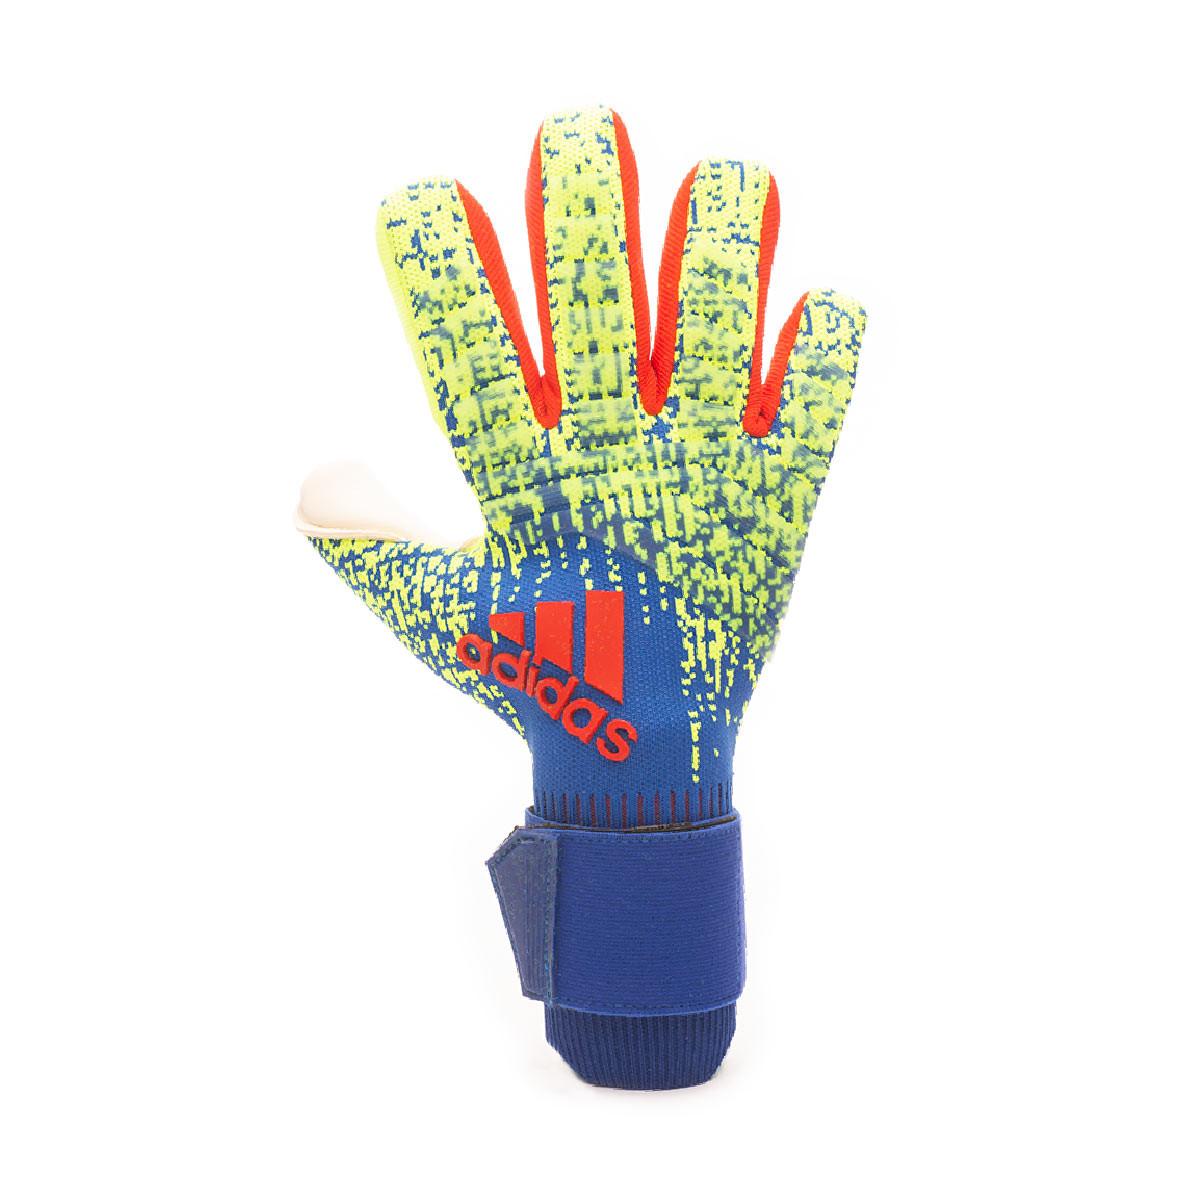 cheaper cheap where to buy adidas Predator Pro PC Glove